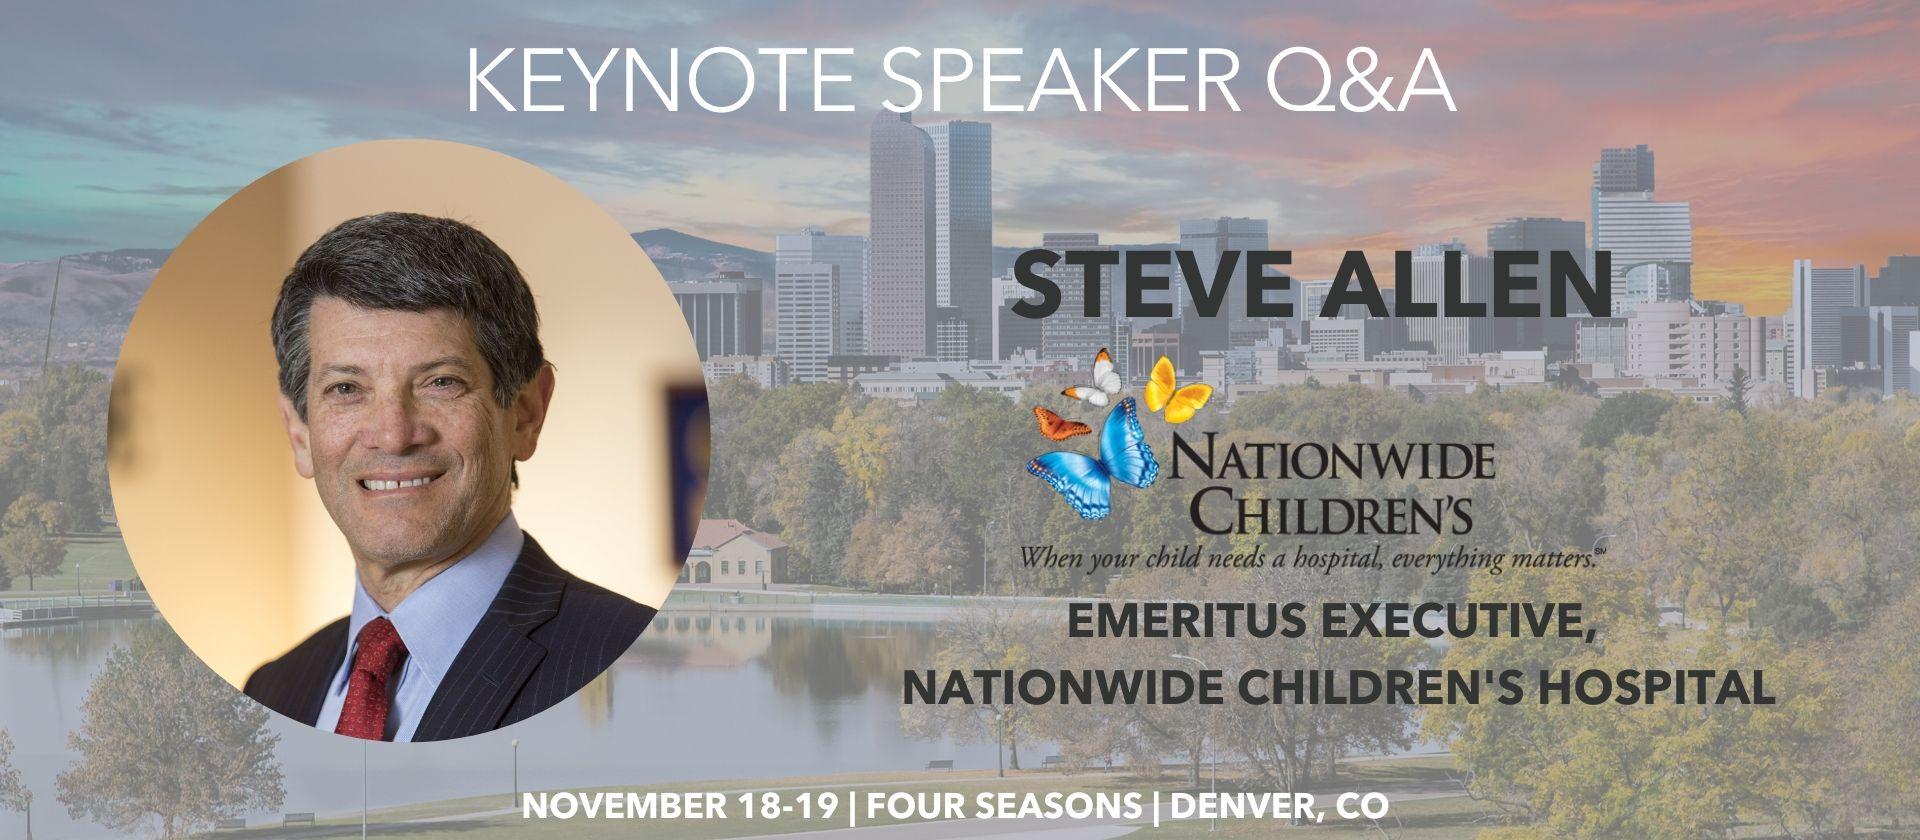 Steve Allen Nationwide Children's Keynote Speaker Q&A